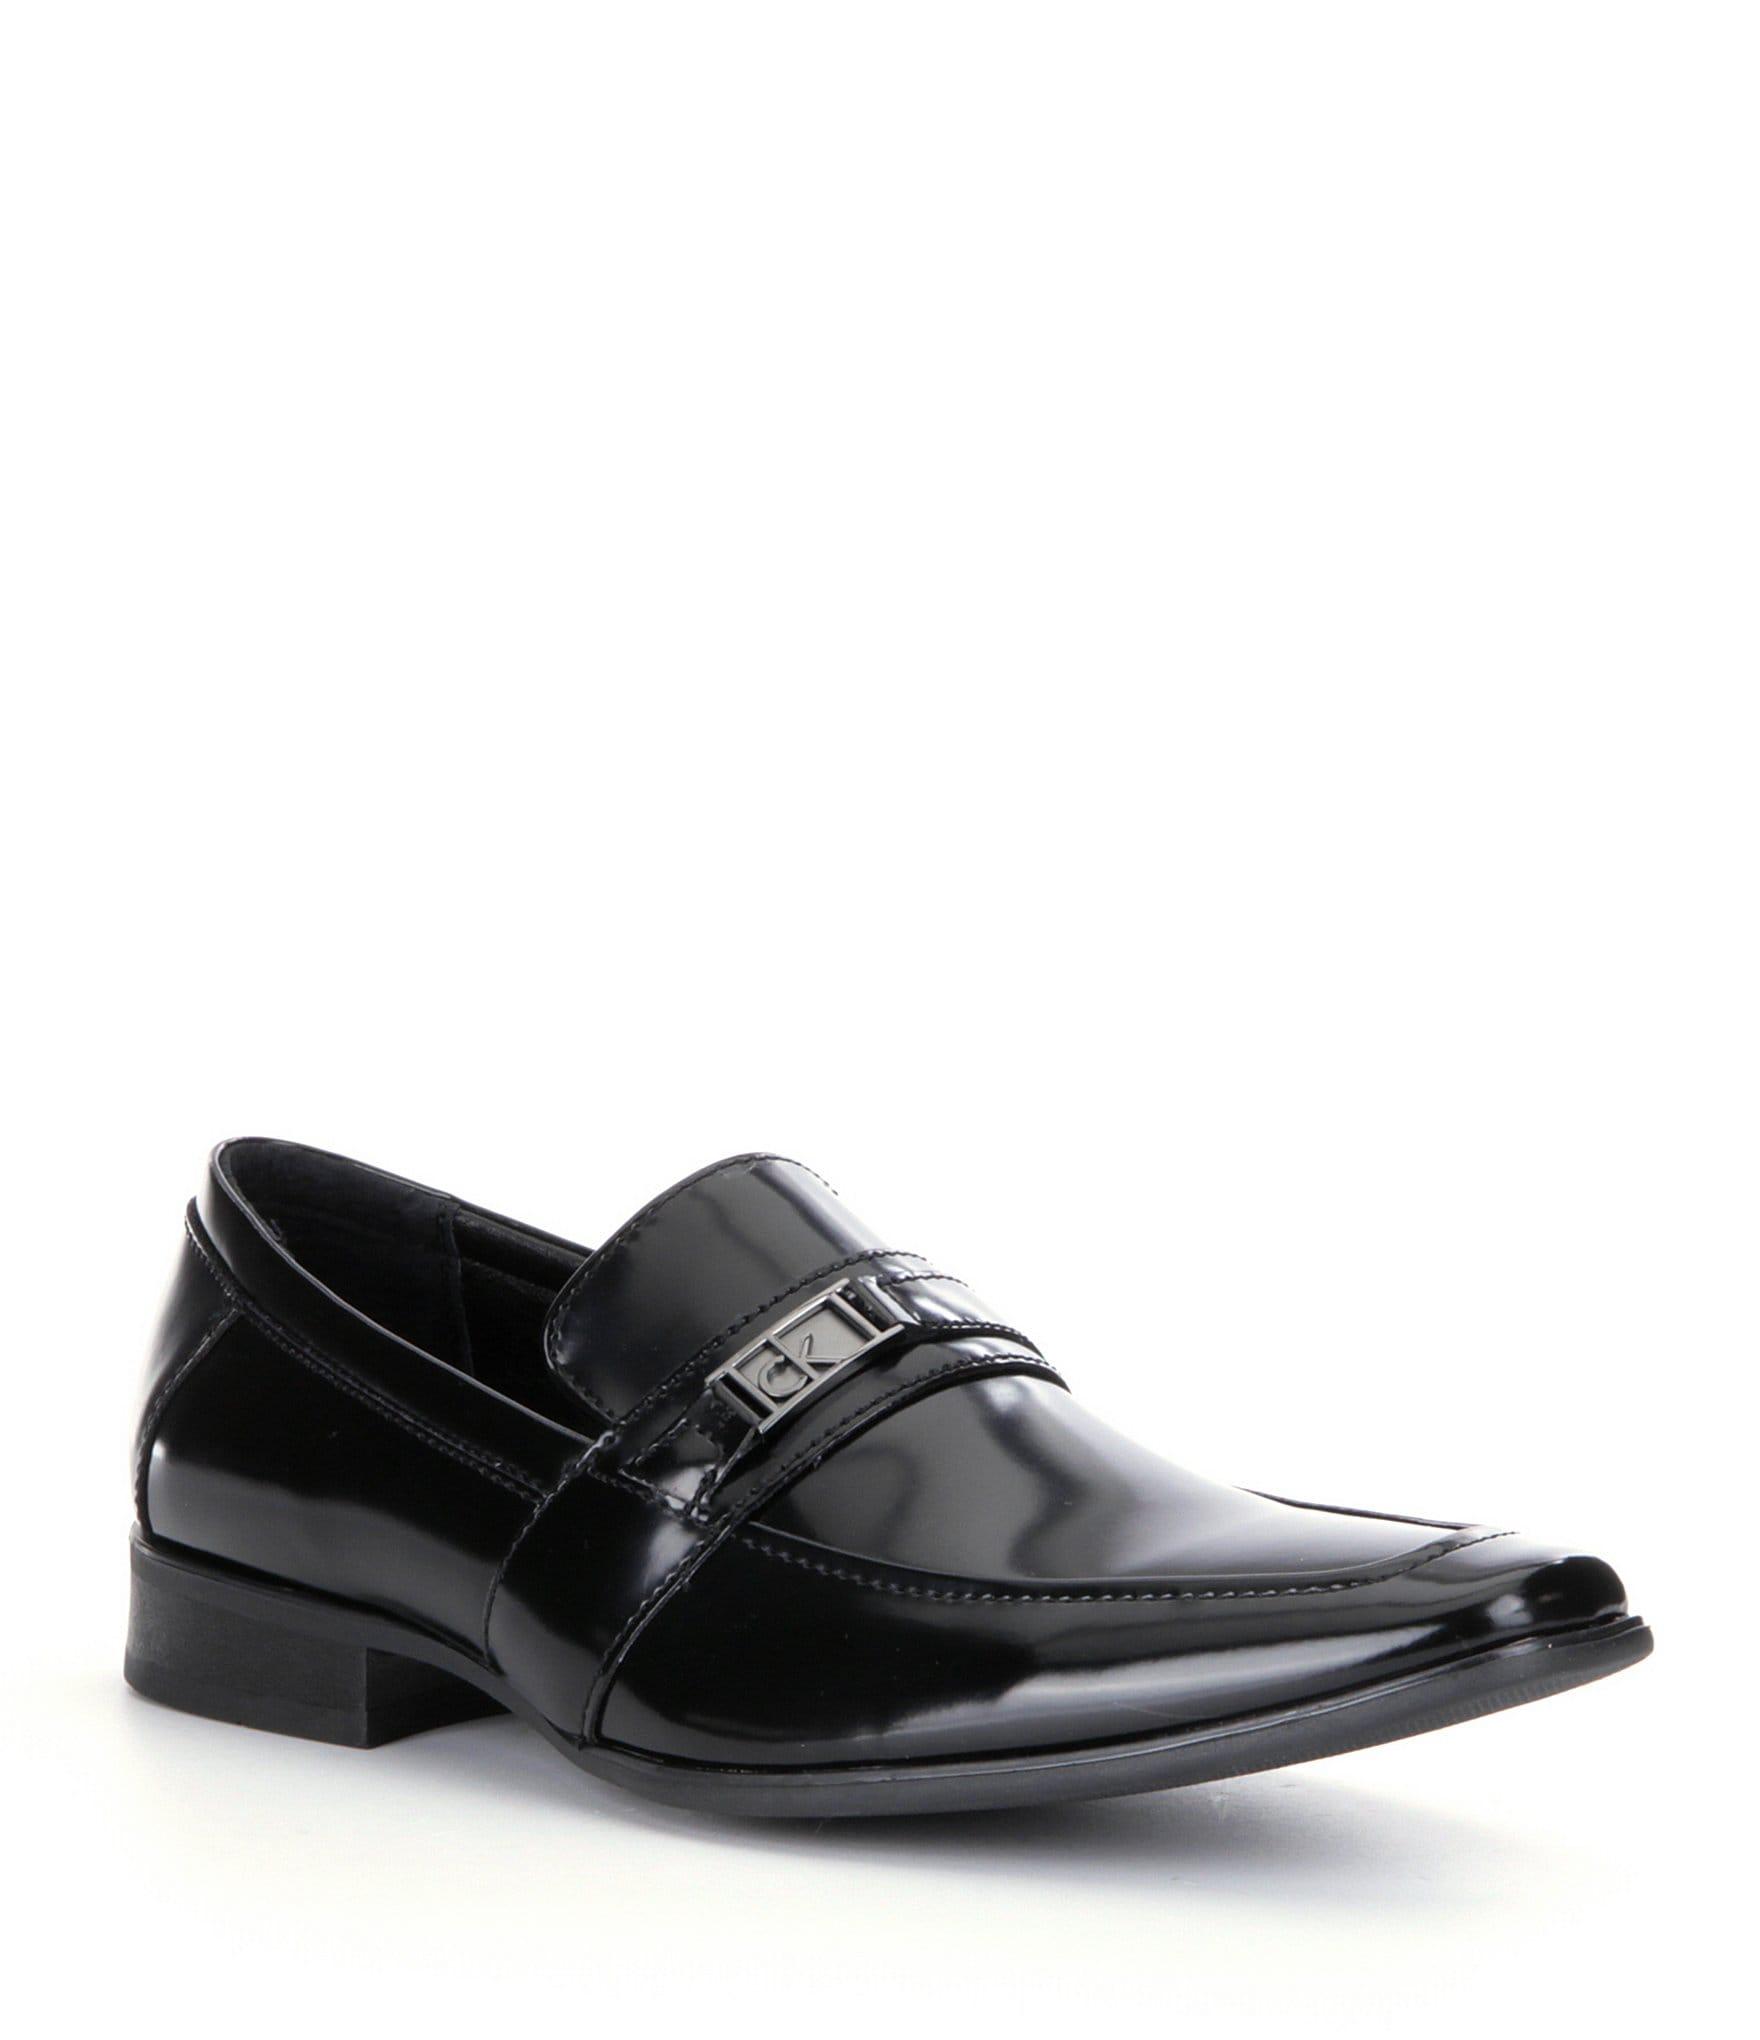 calvin klein bartley 180 s patent dress shoes dillards